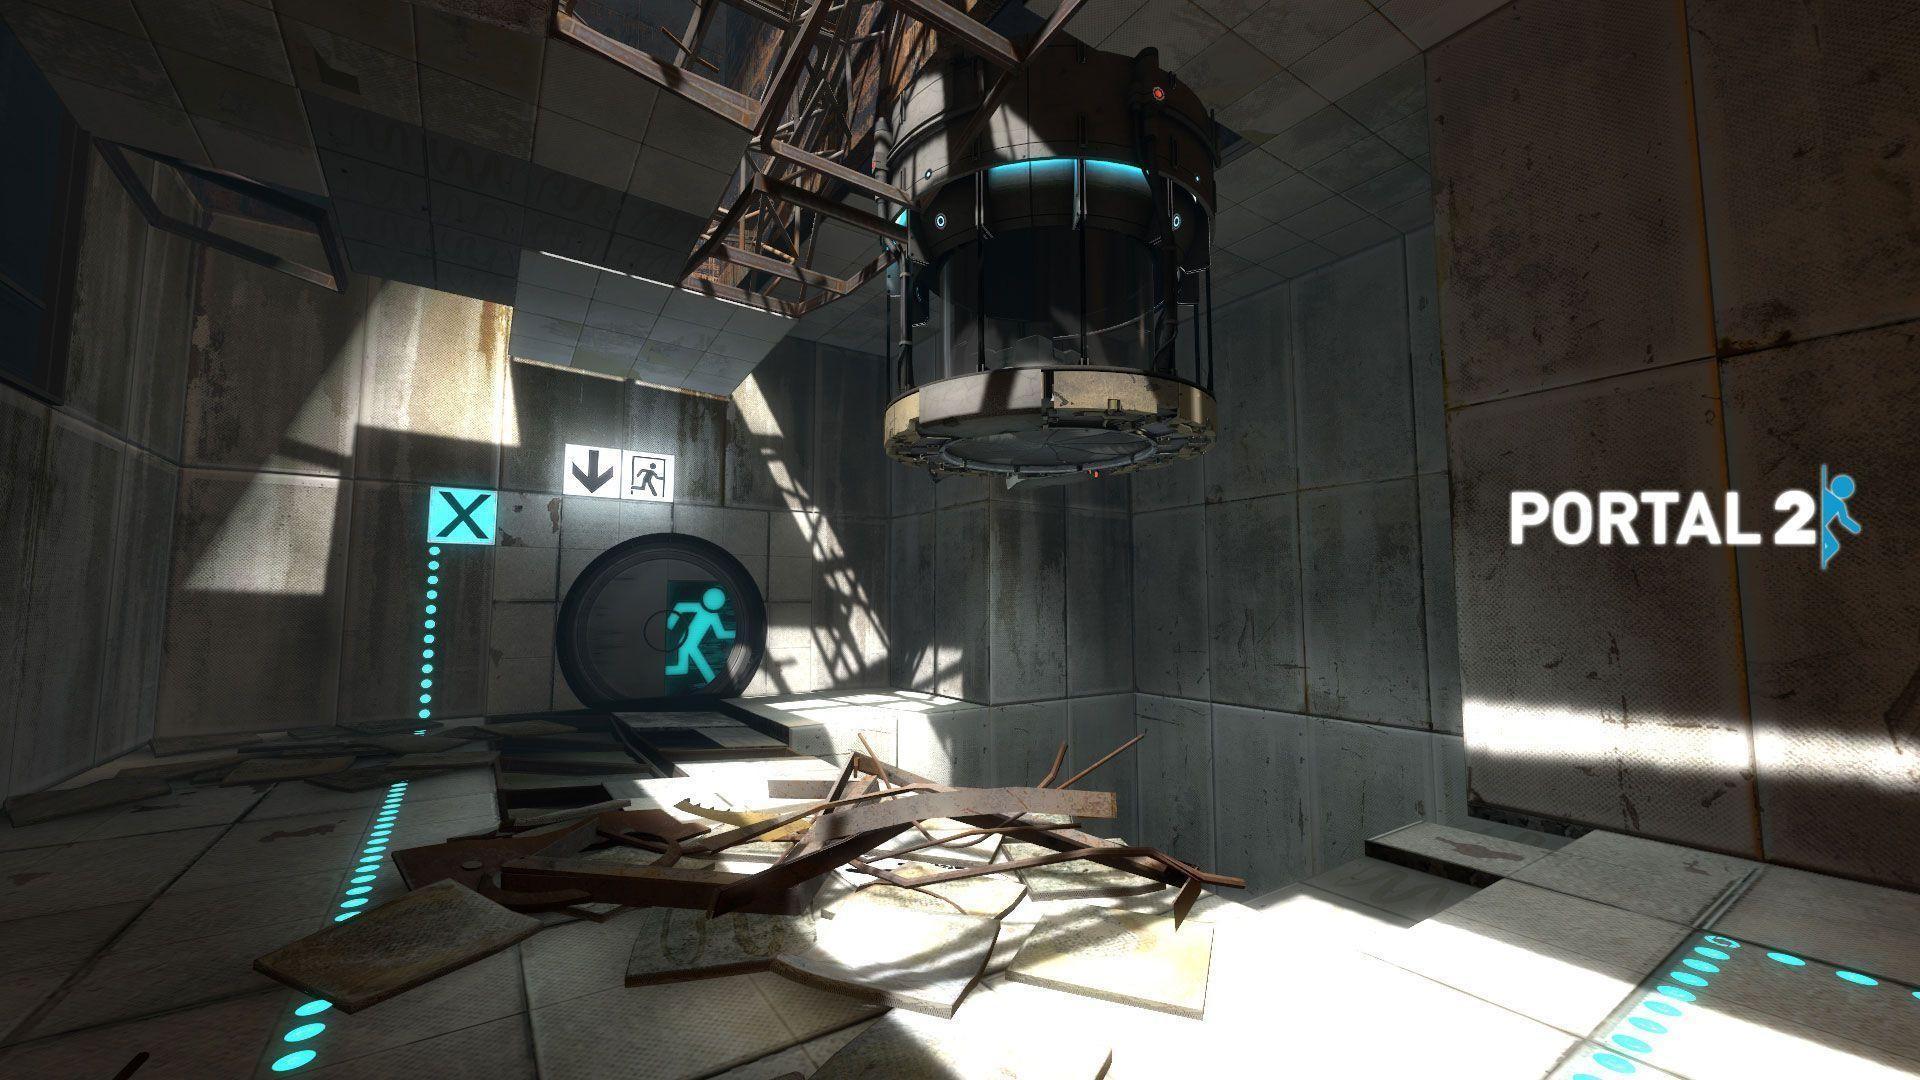 Hd Portal 2 Background